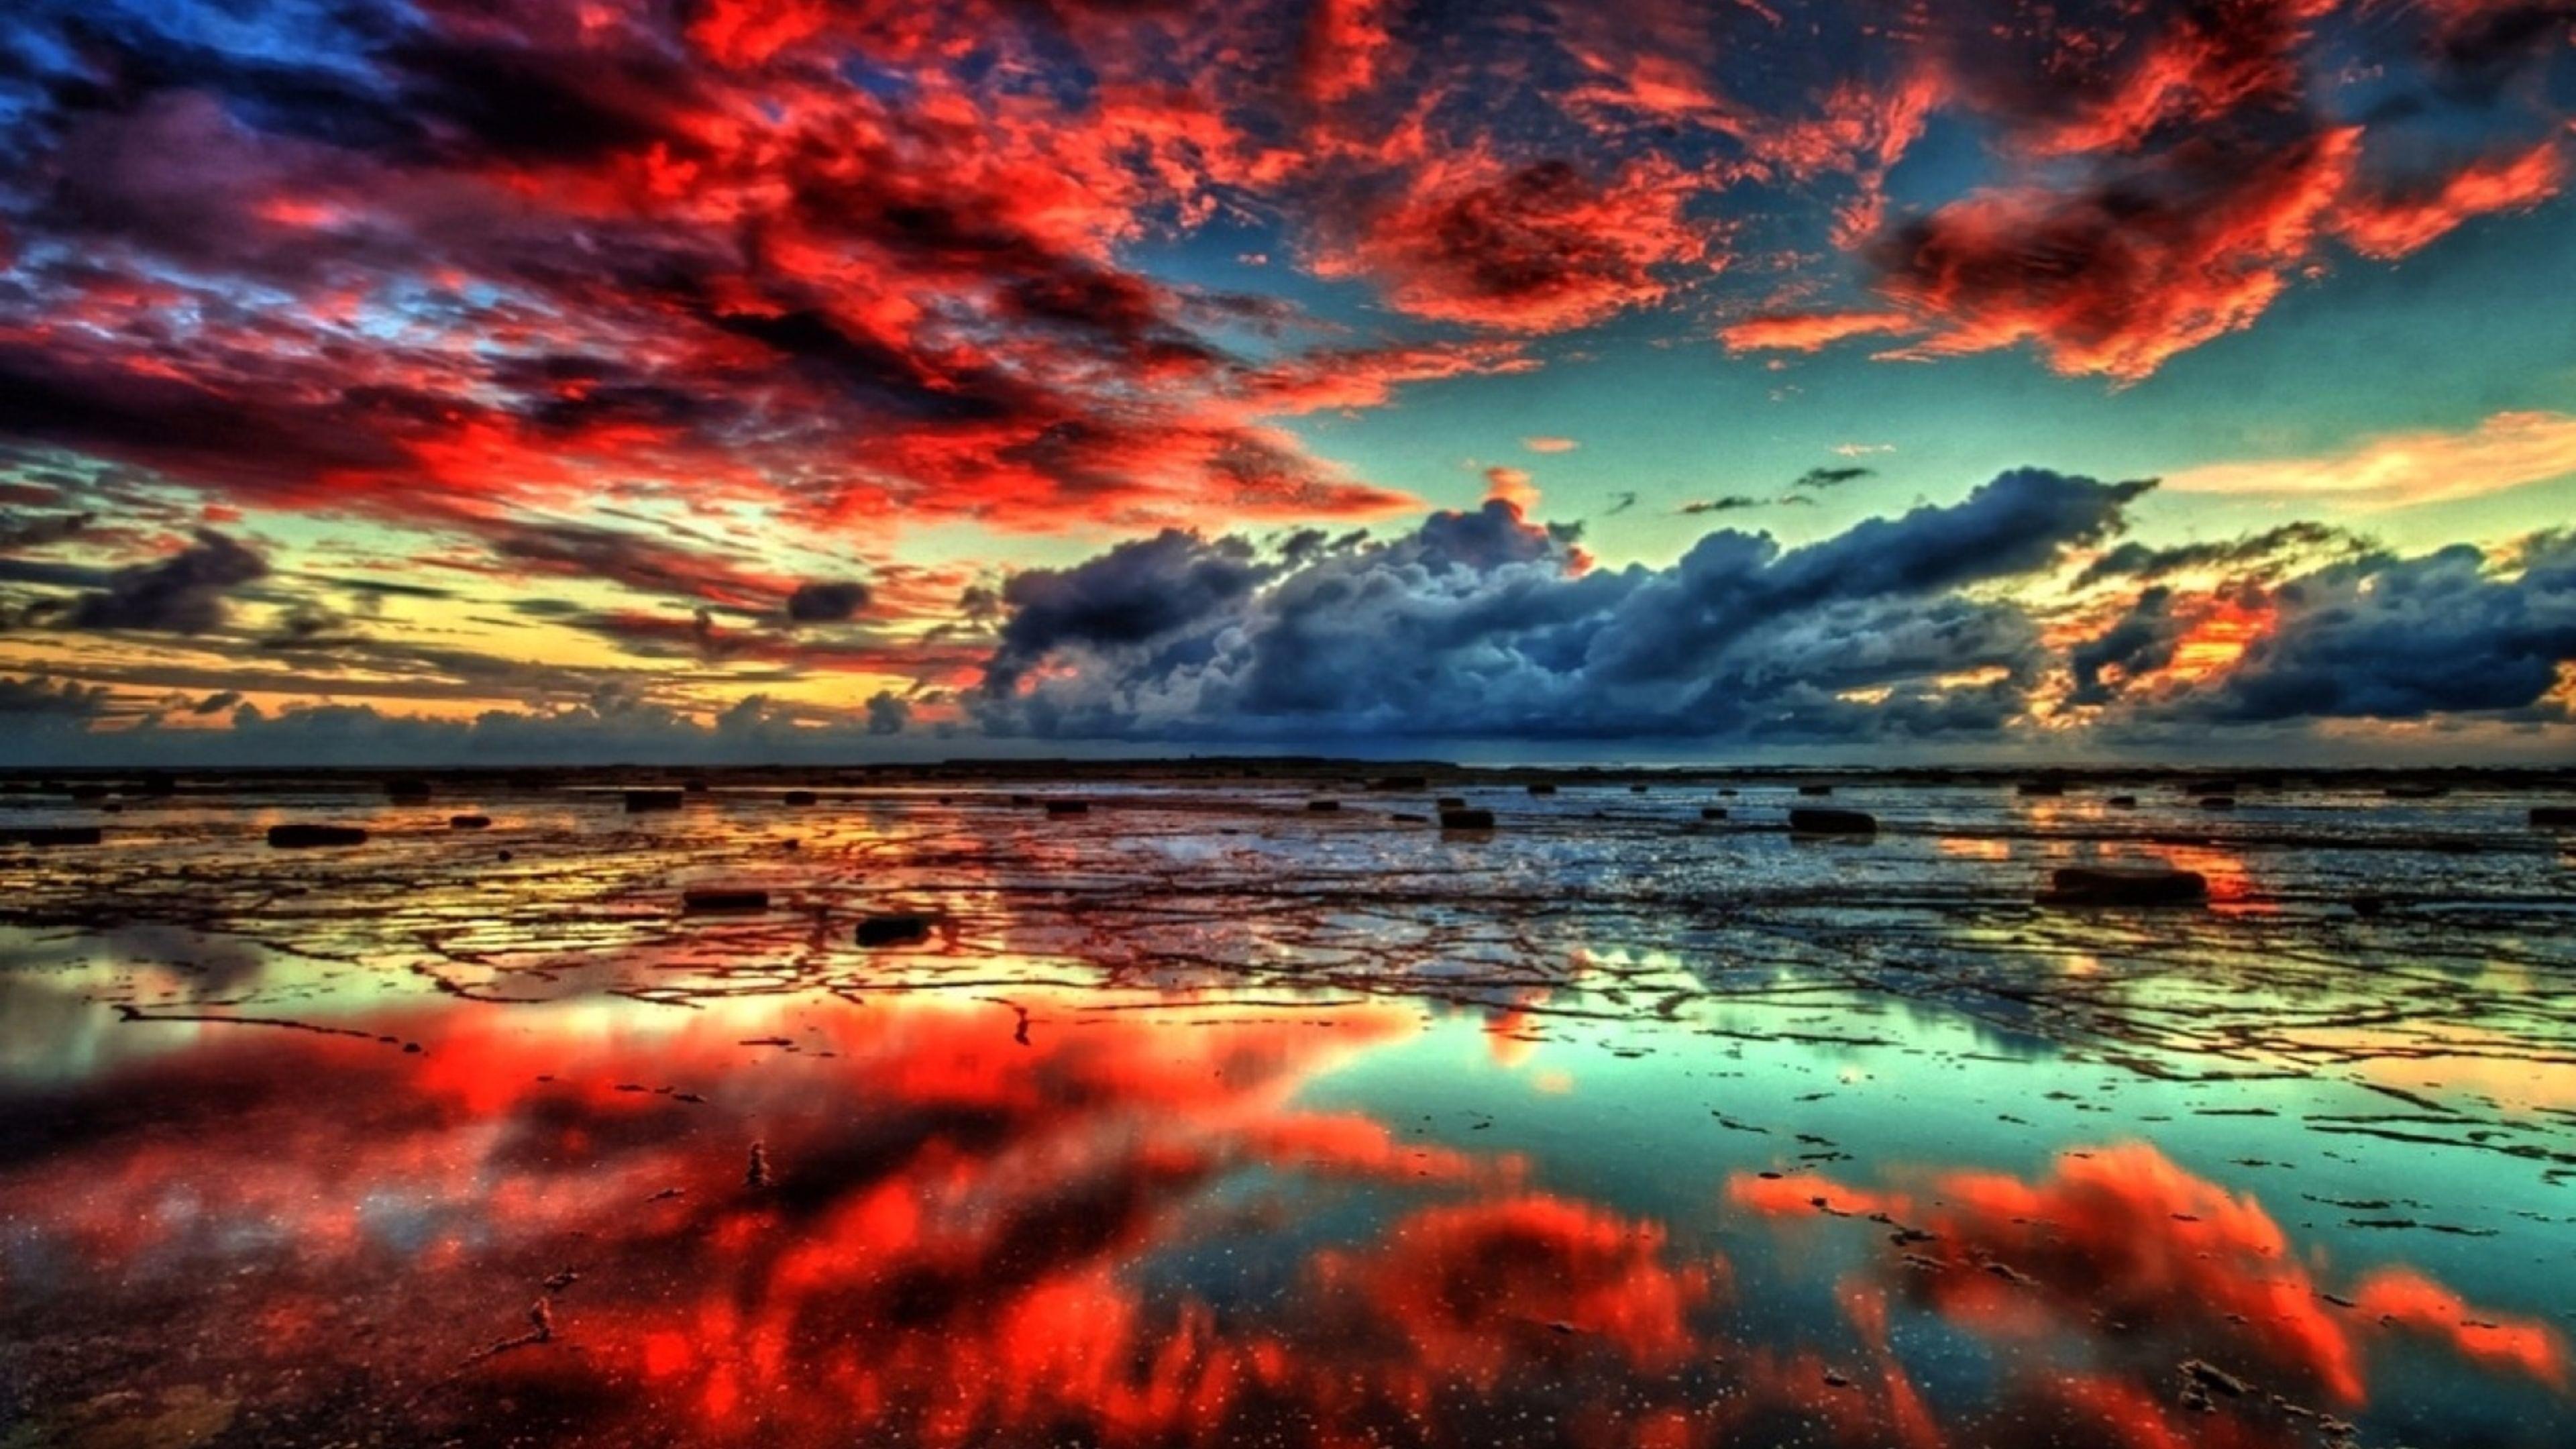 Wallpapers 4k Wallpaper Nature Red Clouds 4K   Free Widescreen Hd wallpaper  nature …